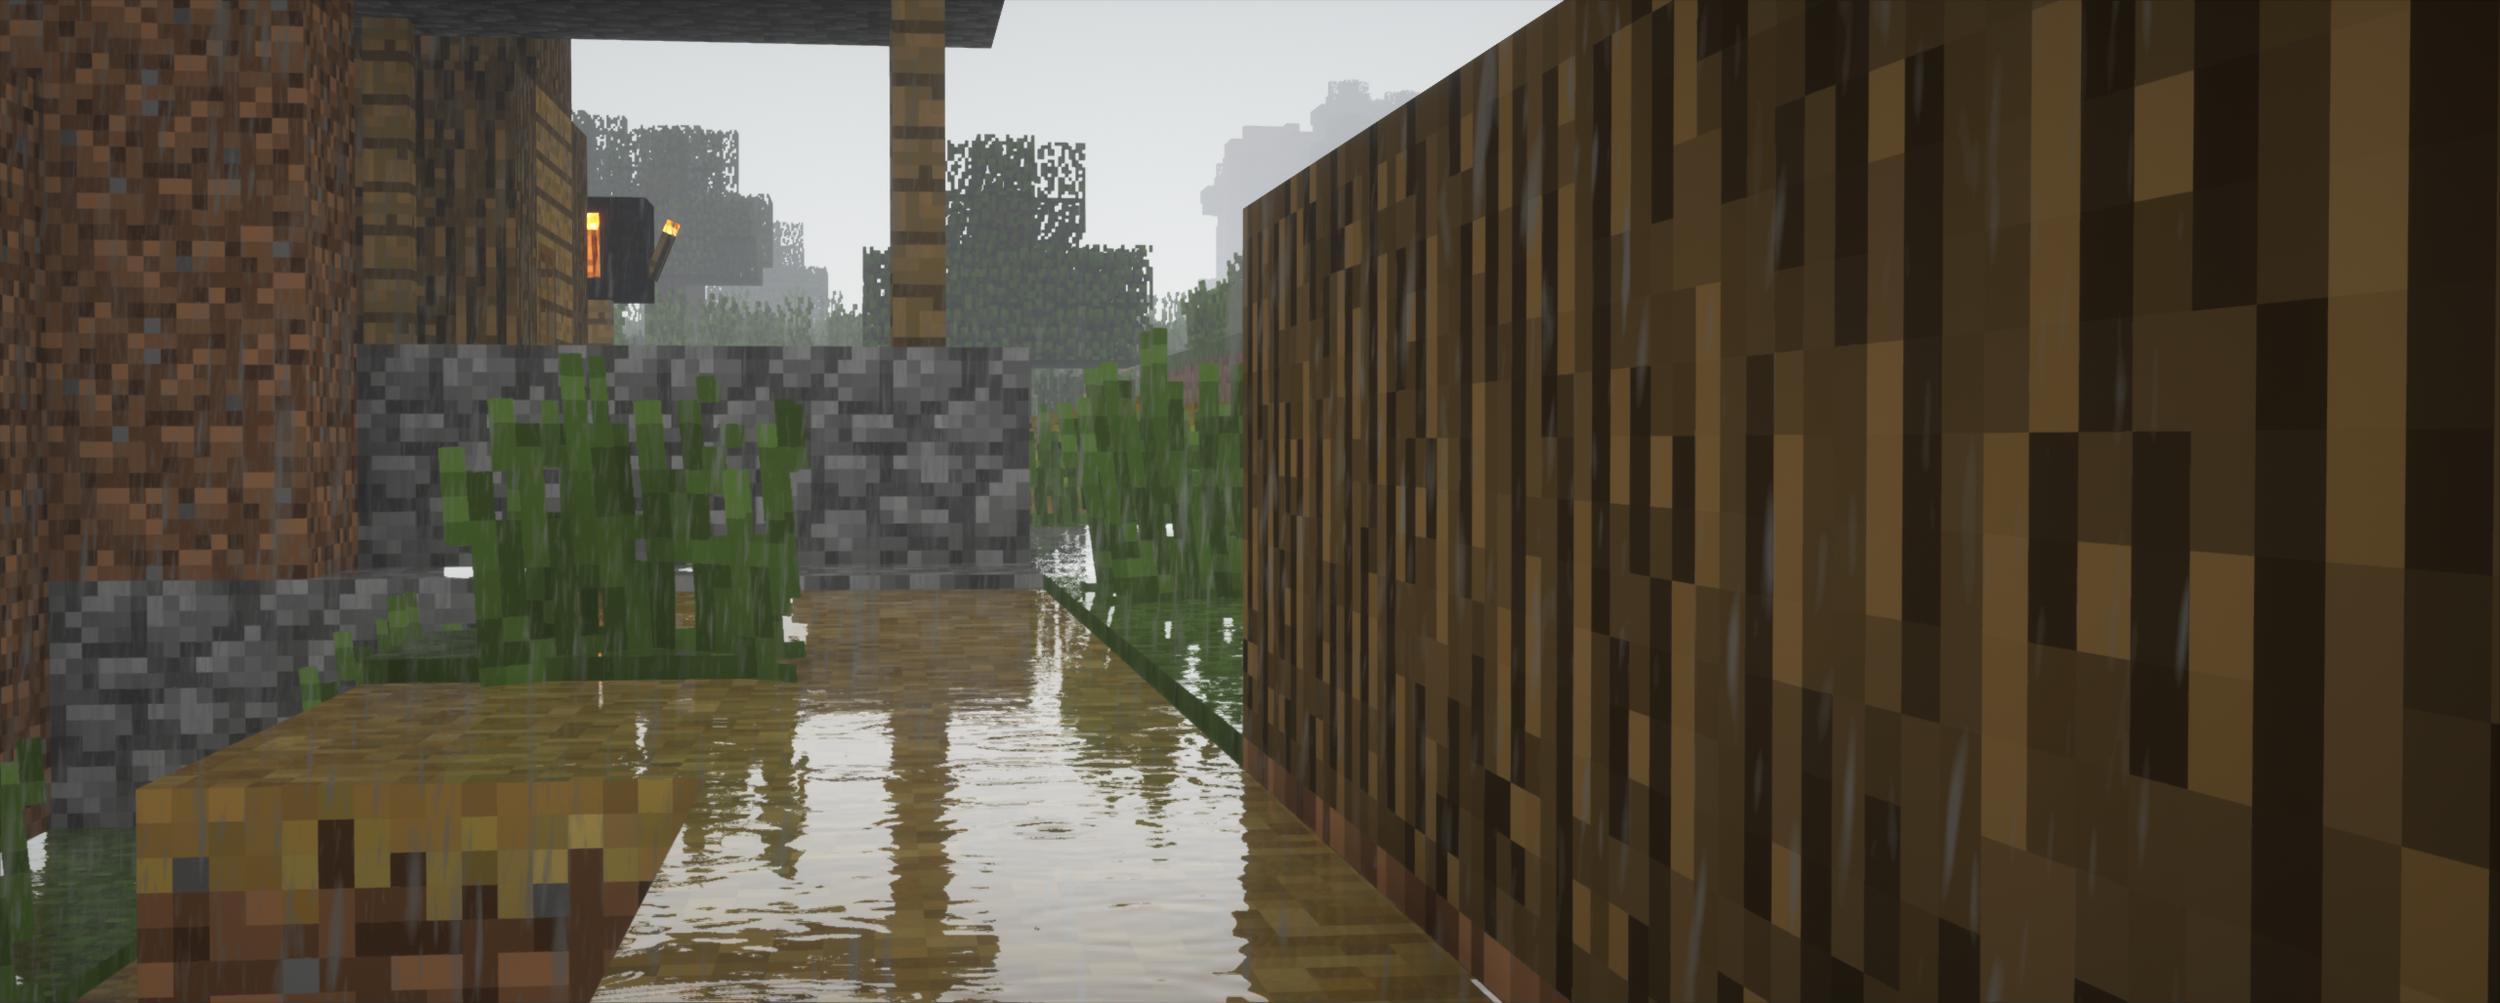 Rain texture, pretty self explanatory change.